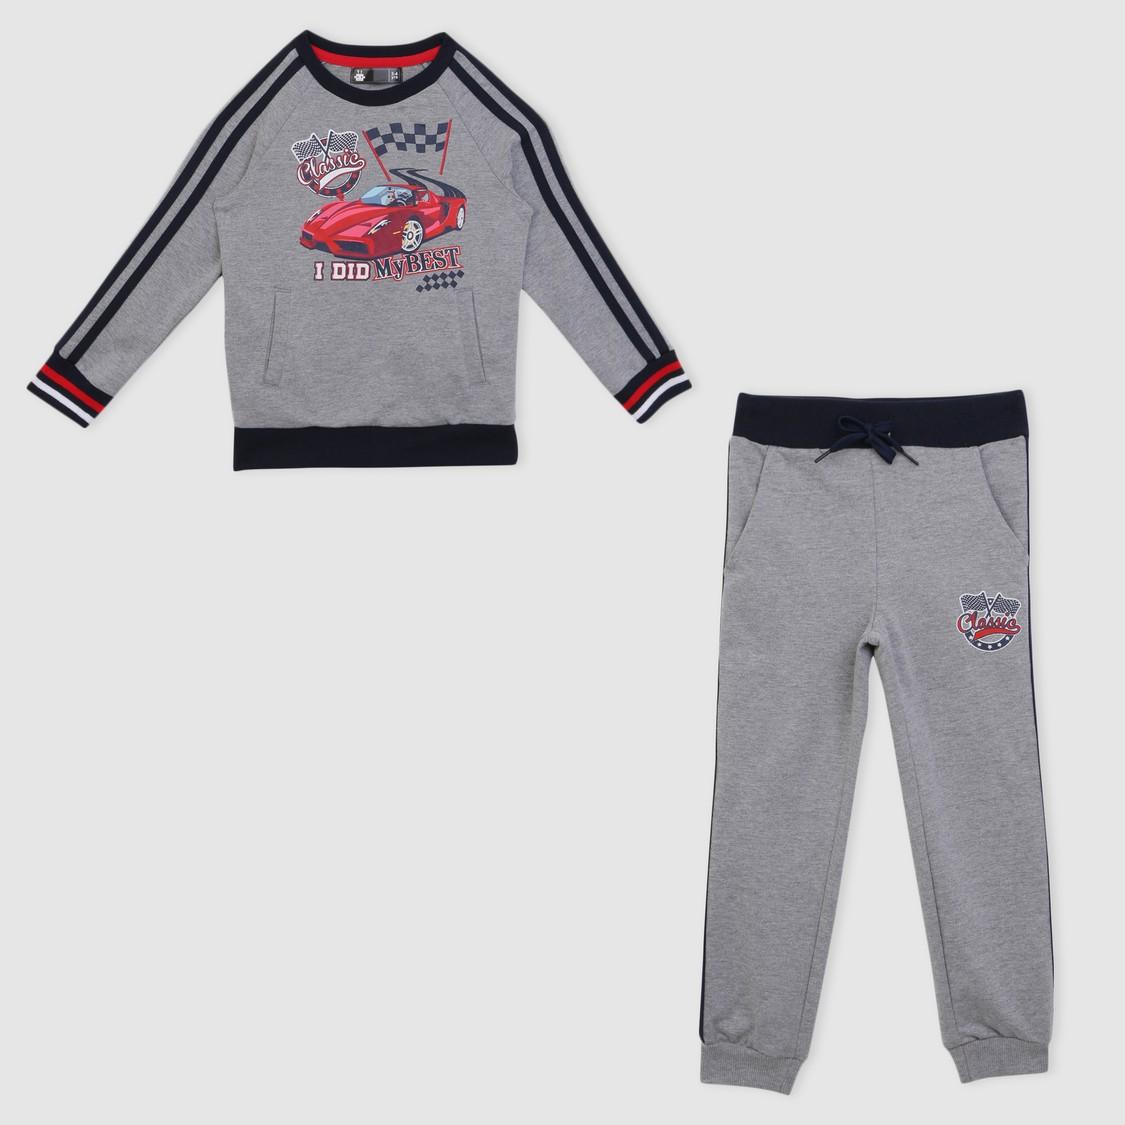 Printed Sweatshirt and Jog Pants Set